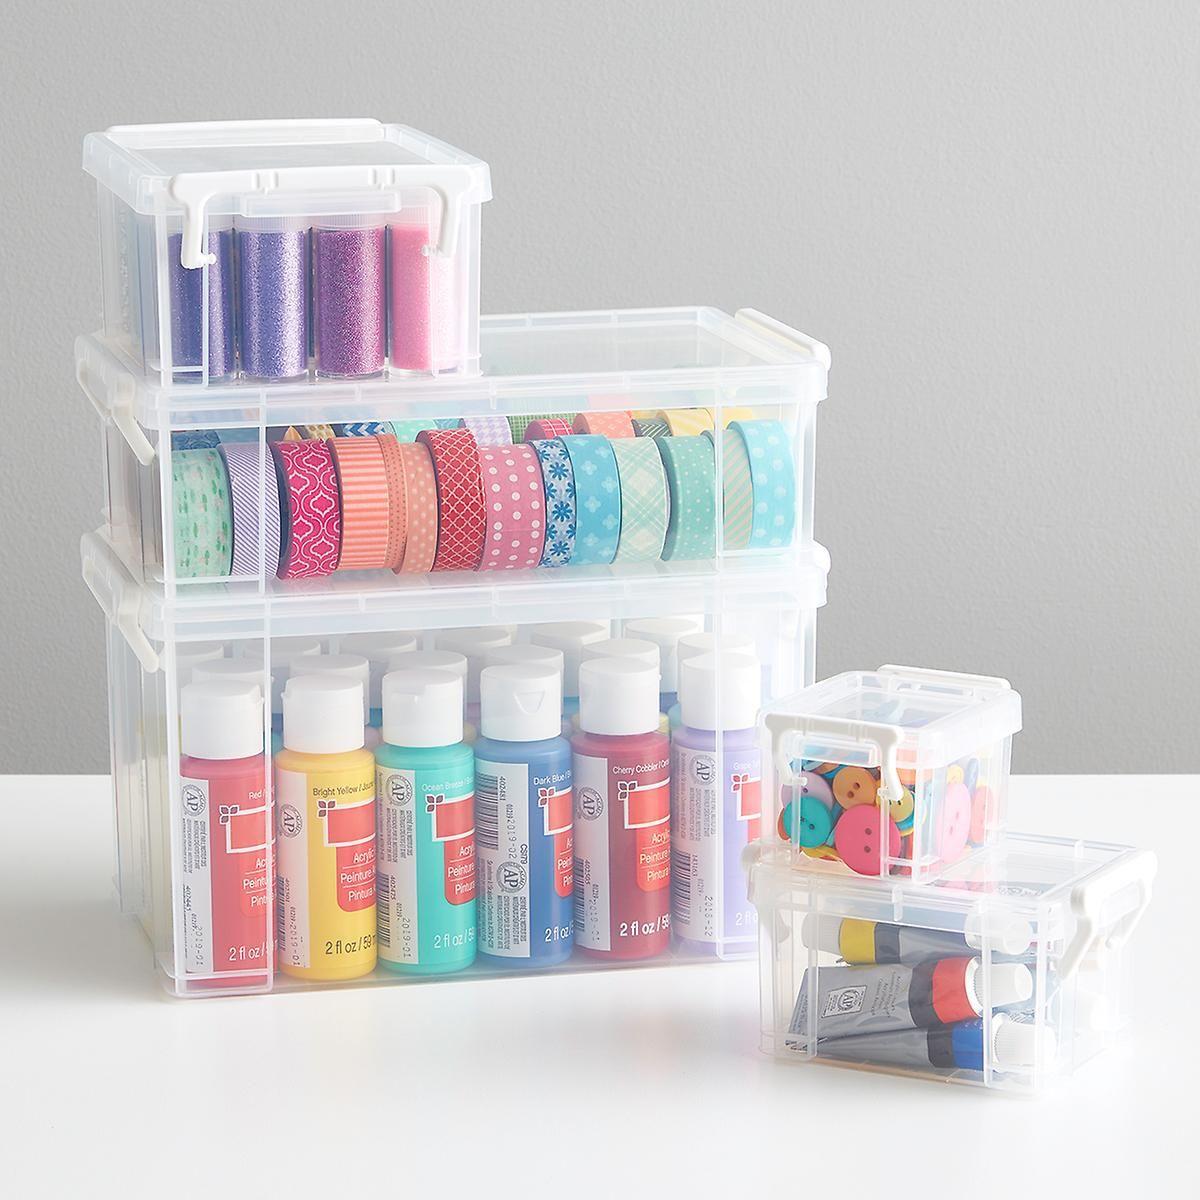 Clear Latch Boxes In 2020 Acrylic Paint Storage Craft Storage Plastic Box Storage